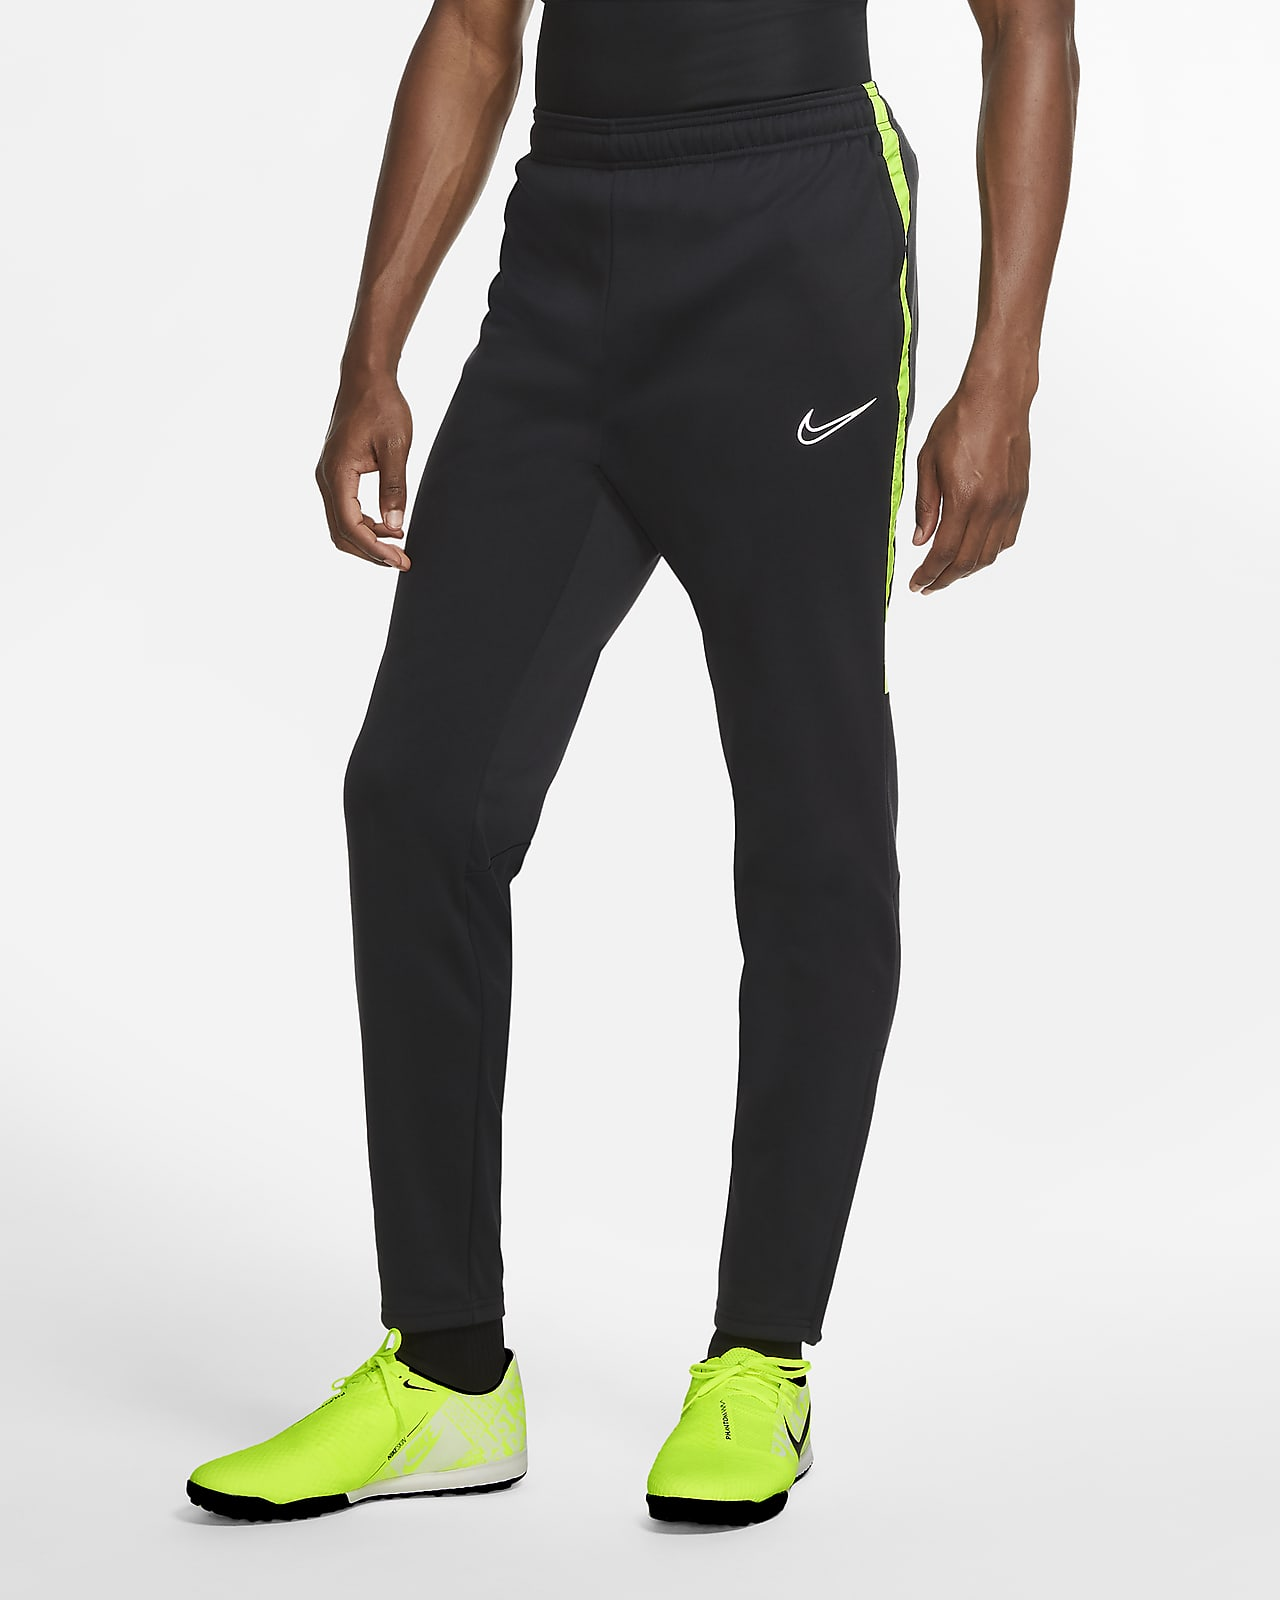 Pantalon de football Nike Therma Academy Winter Warrior pour Homme